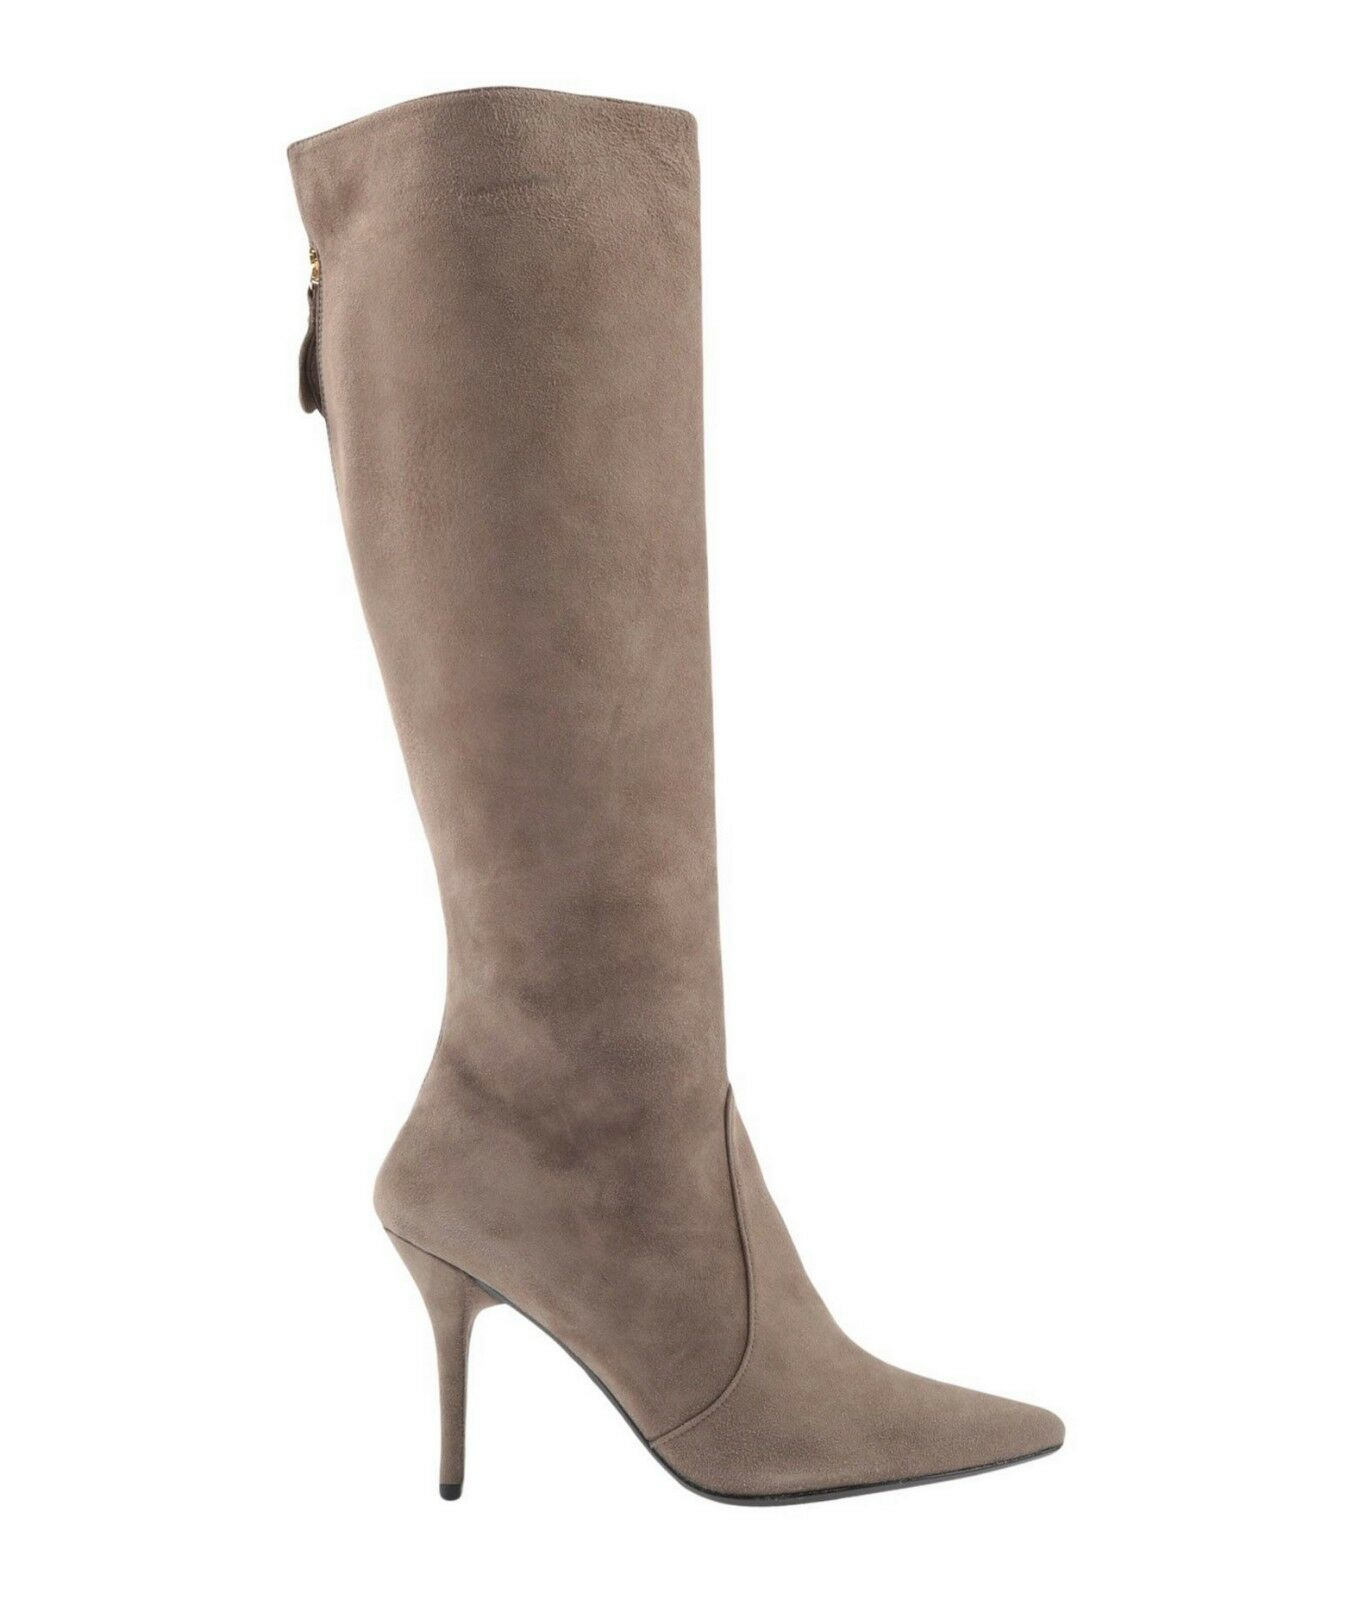 Nuevo Stuart Weitzman tan caliente Alto Gamuza botas botas botas Altas, Marrón, 38.5M  765  Mejor precio